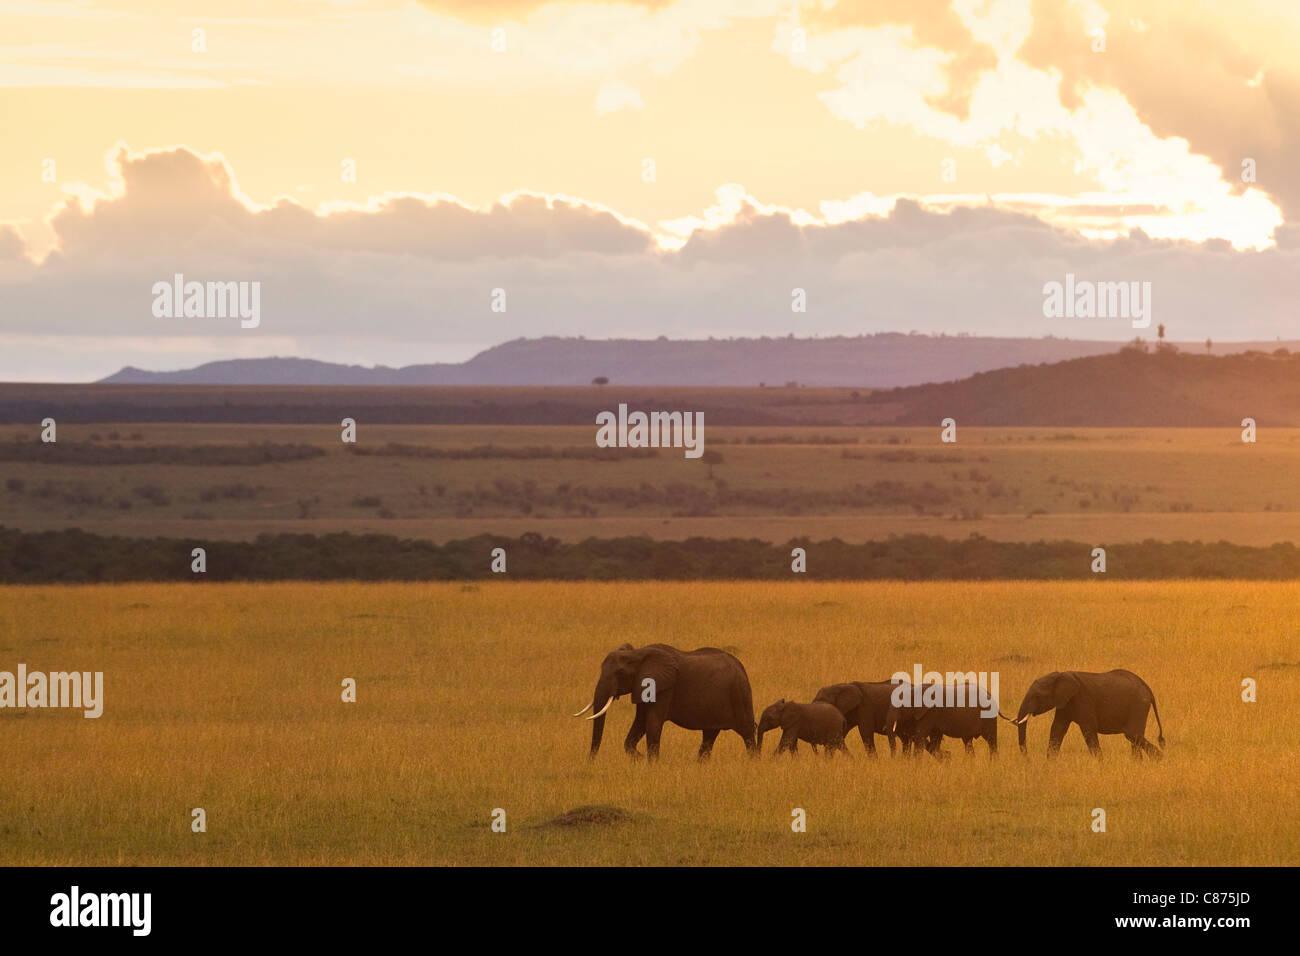 Bush africano elefantes, Reserva Nacional de Masai Mara, Kenya Foto de stock